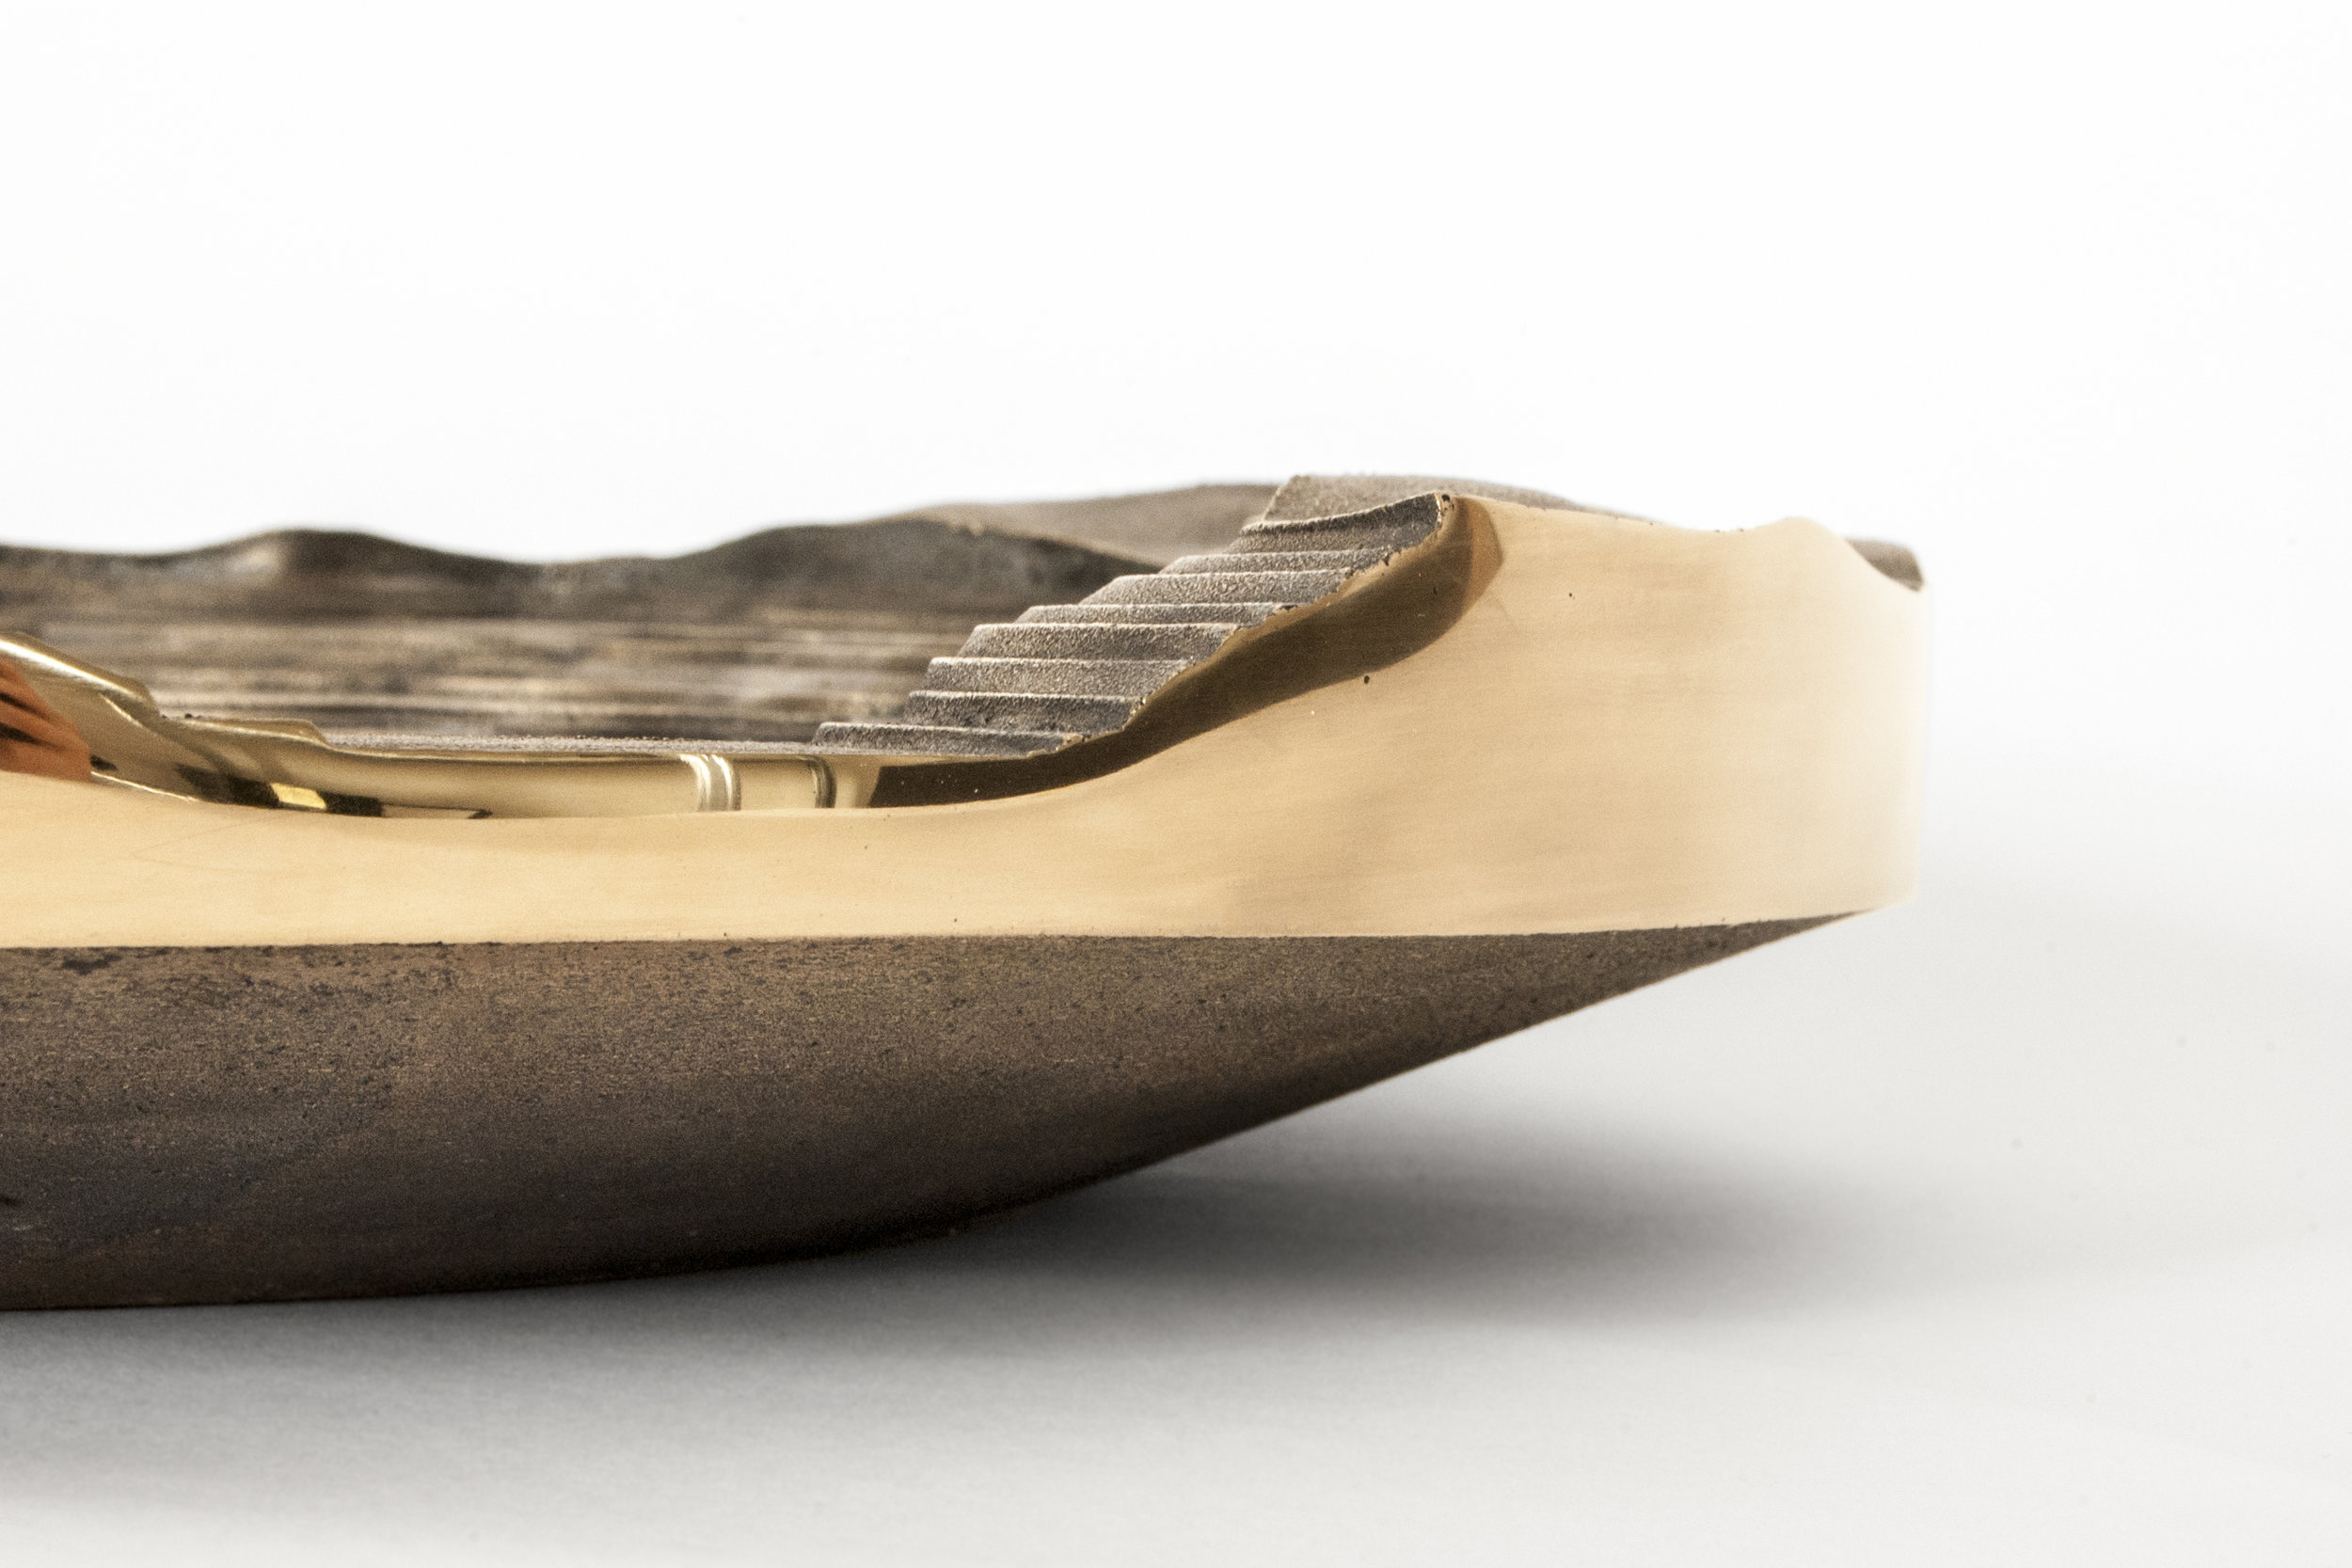 Copper Mining bowl side view - David Derksen Design.jpg